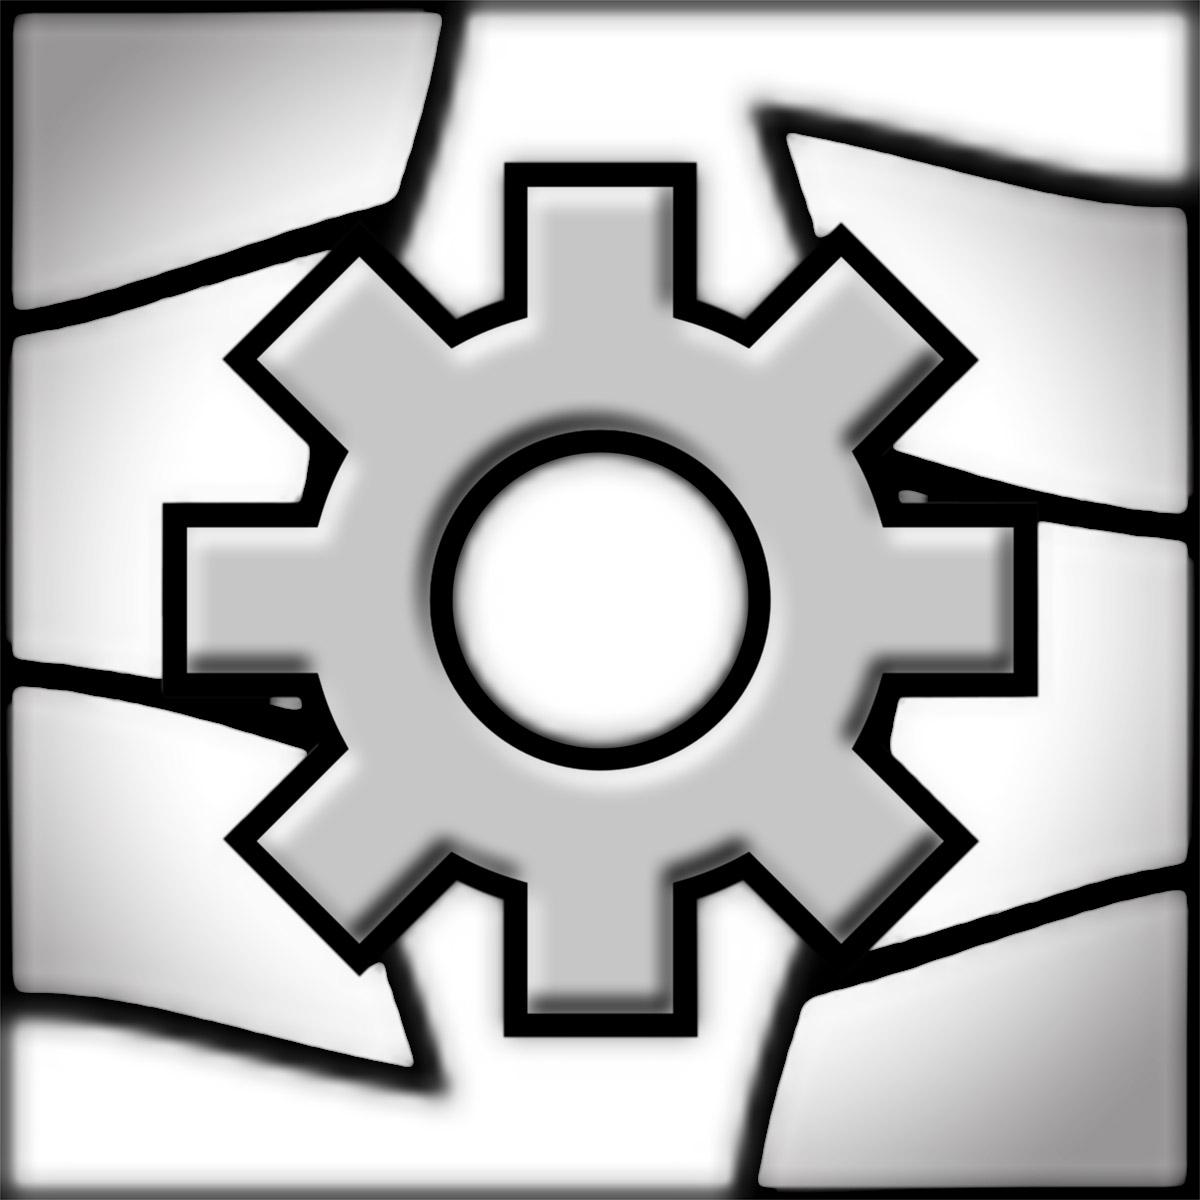 VirtualDub x265 VFW CODEC – How To Fix Error